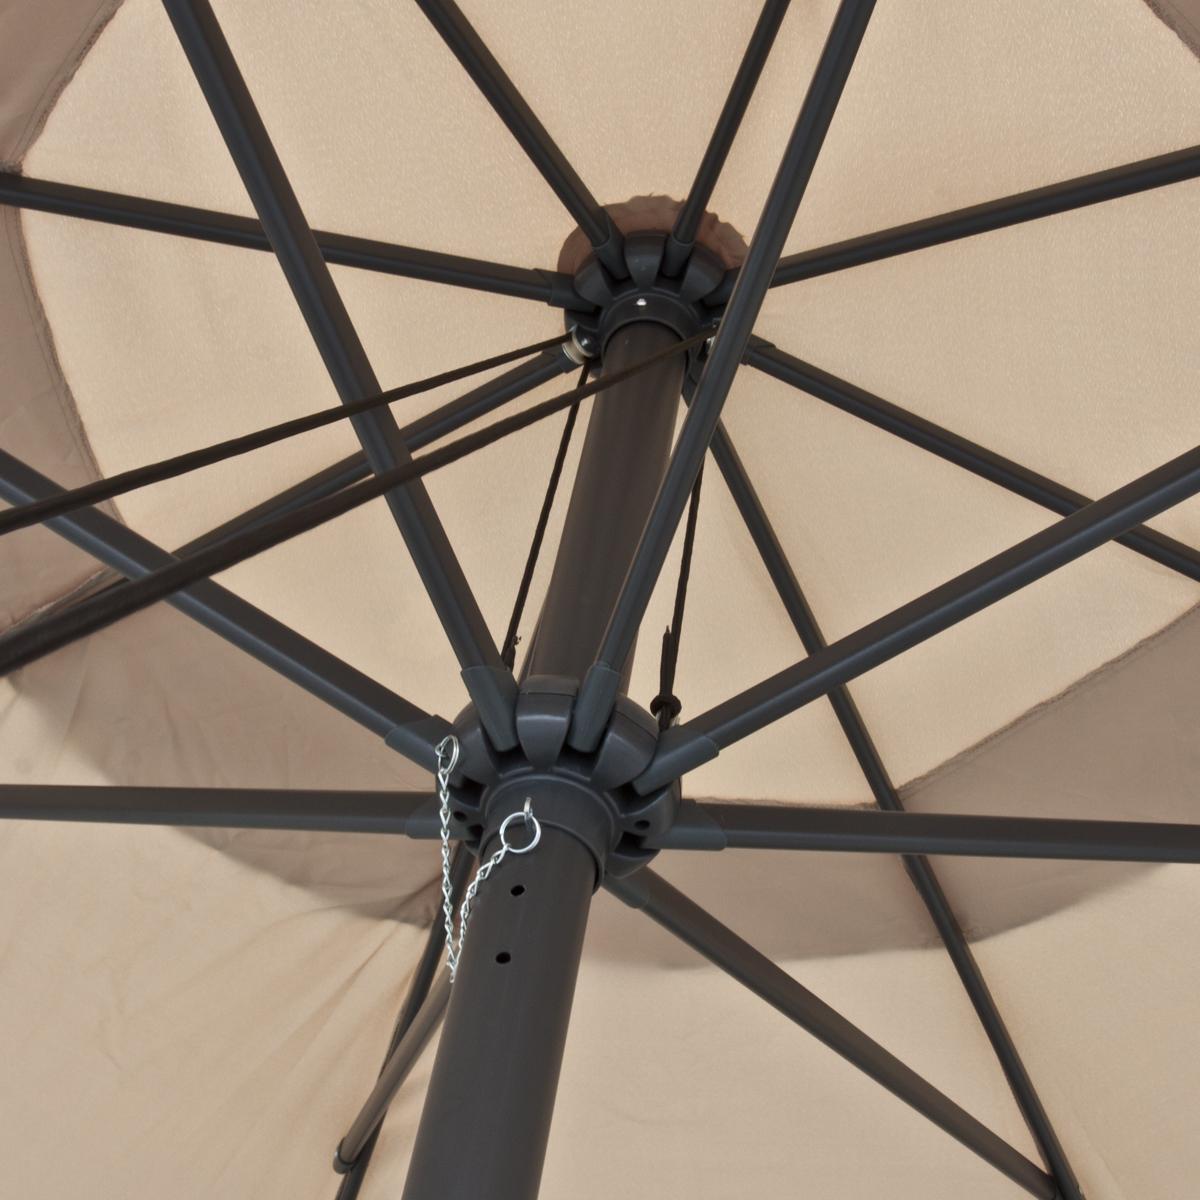 large patio umbrella 13u0027 ft feet beige tent deck gazebo sun shade cover market - Large Patio Umbrellas